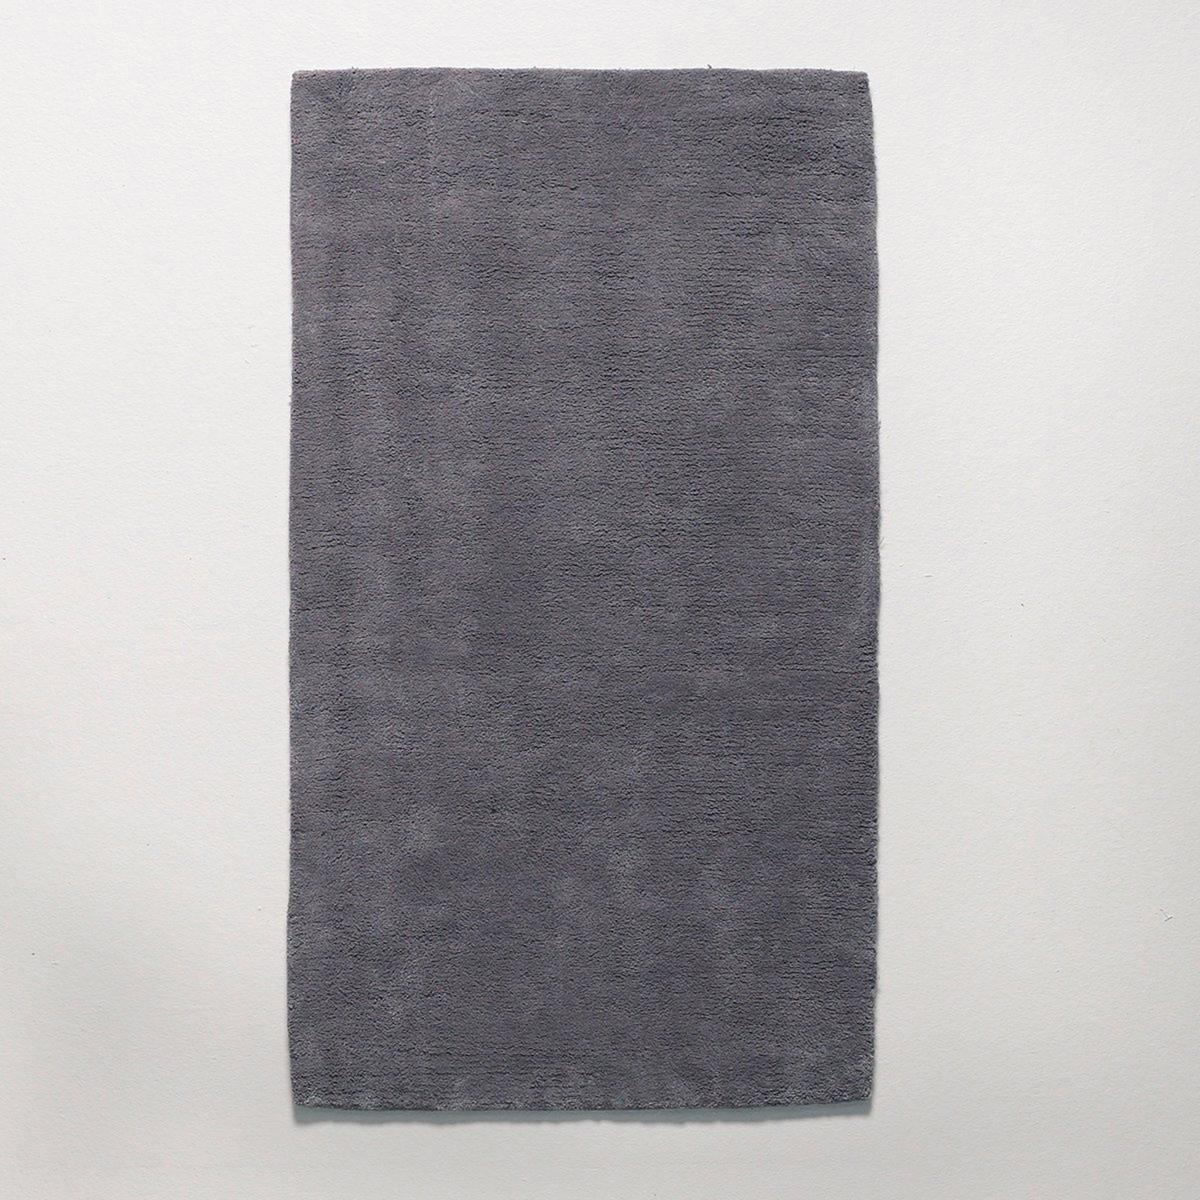 Прикроватный LaRedoute Коврик из хлопка с ворсом Renzo 60 x 110 см серый ковер la redoute с ворсом из хлопка renzo 120 x 170 см серый